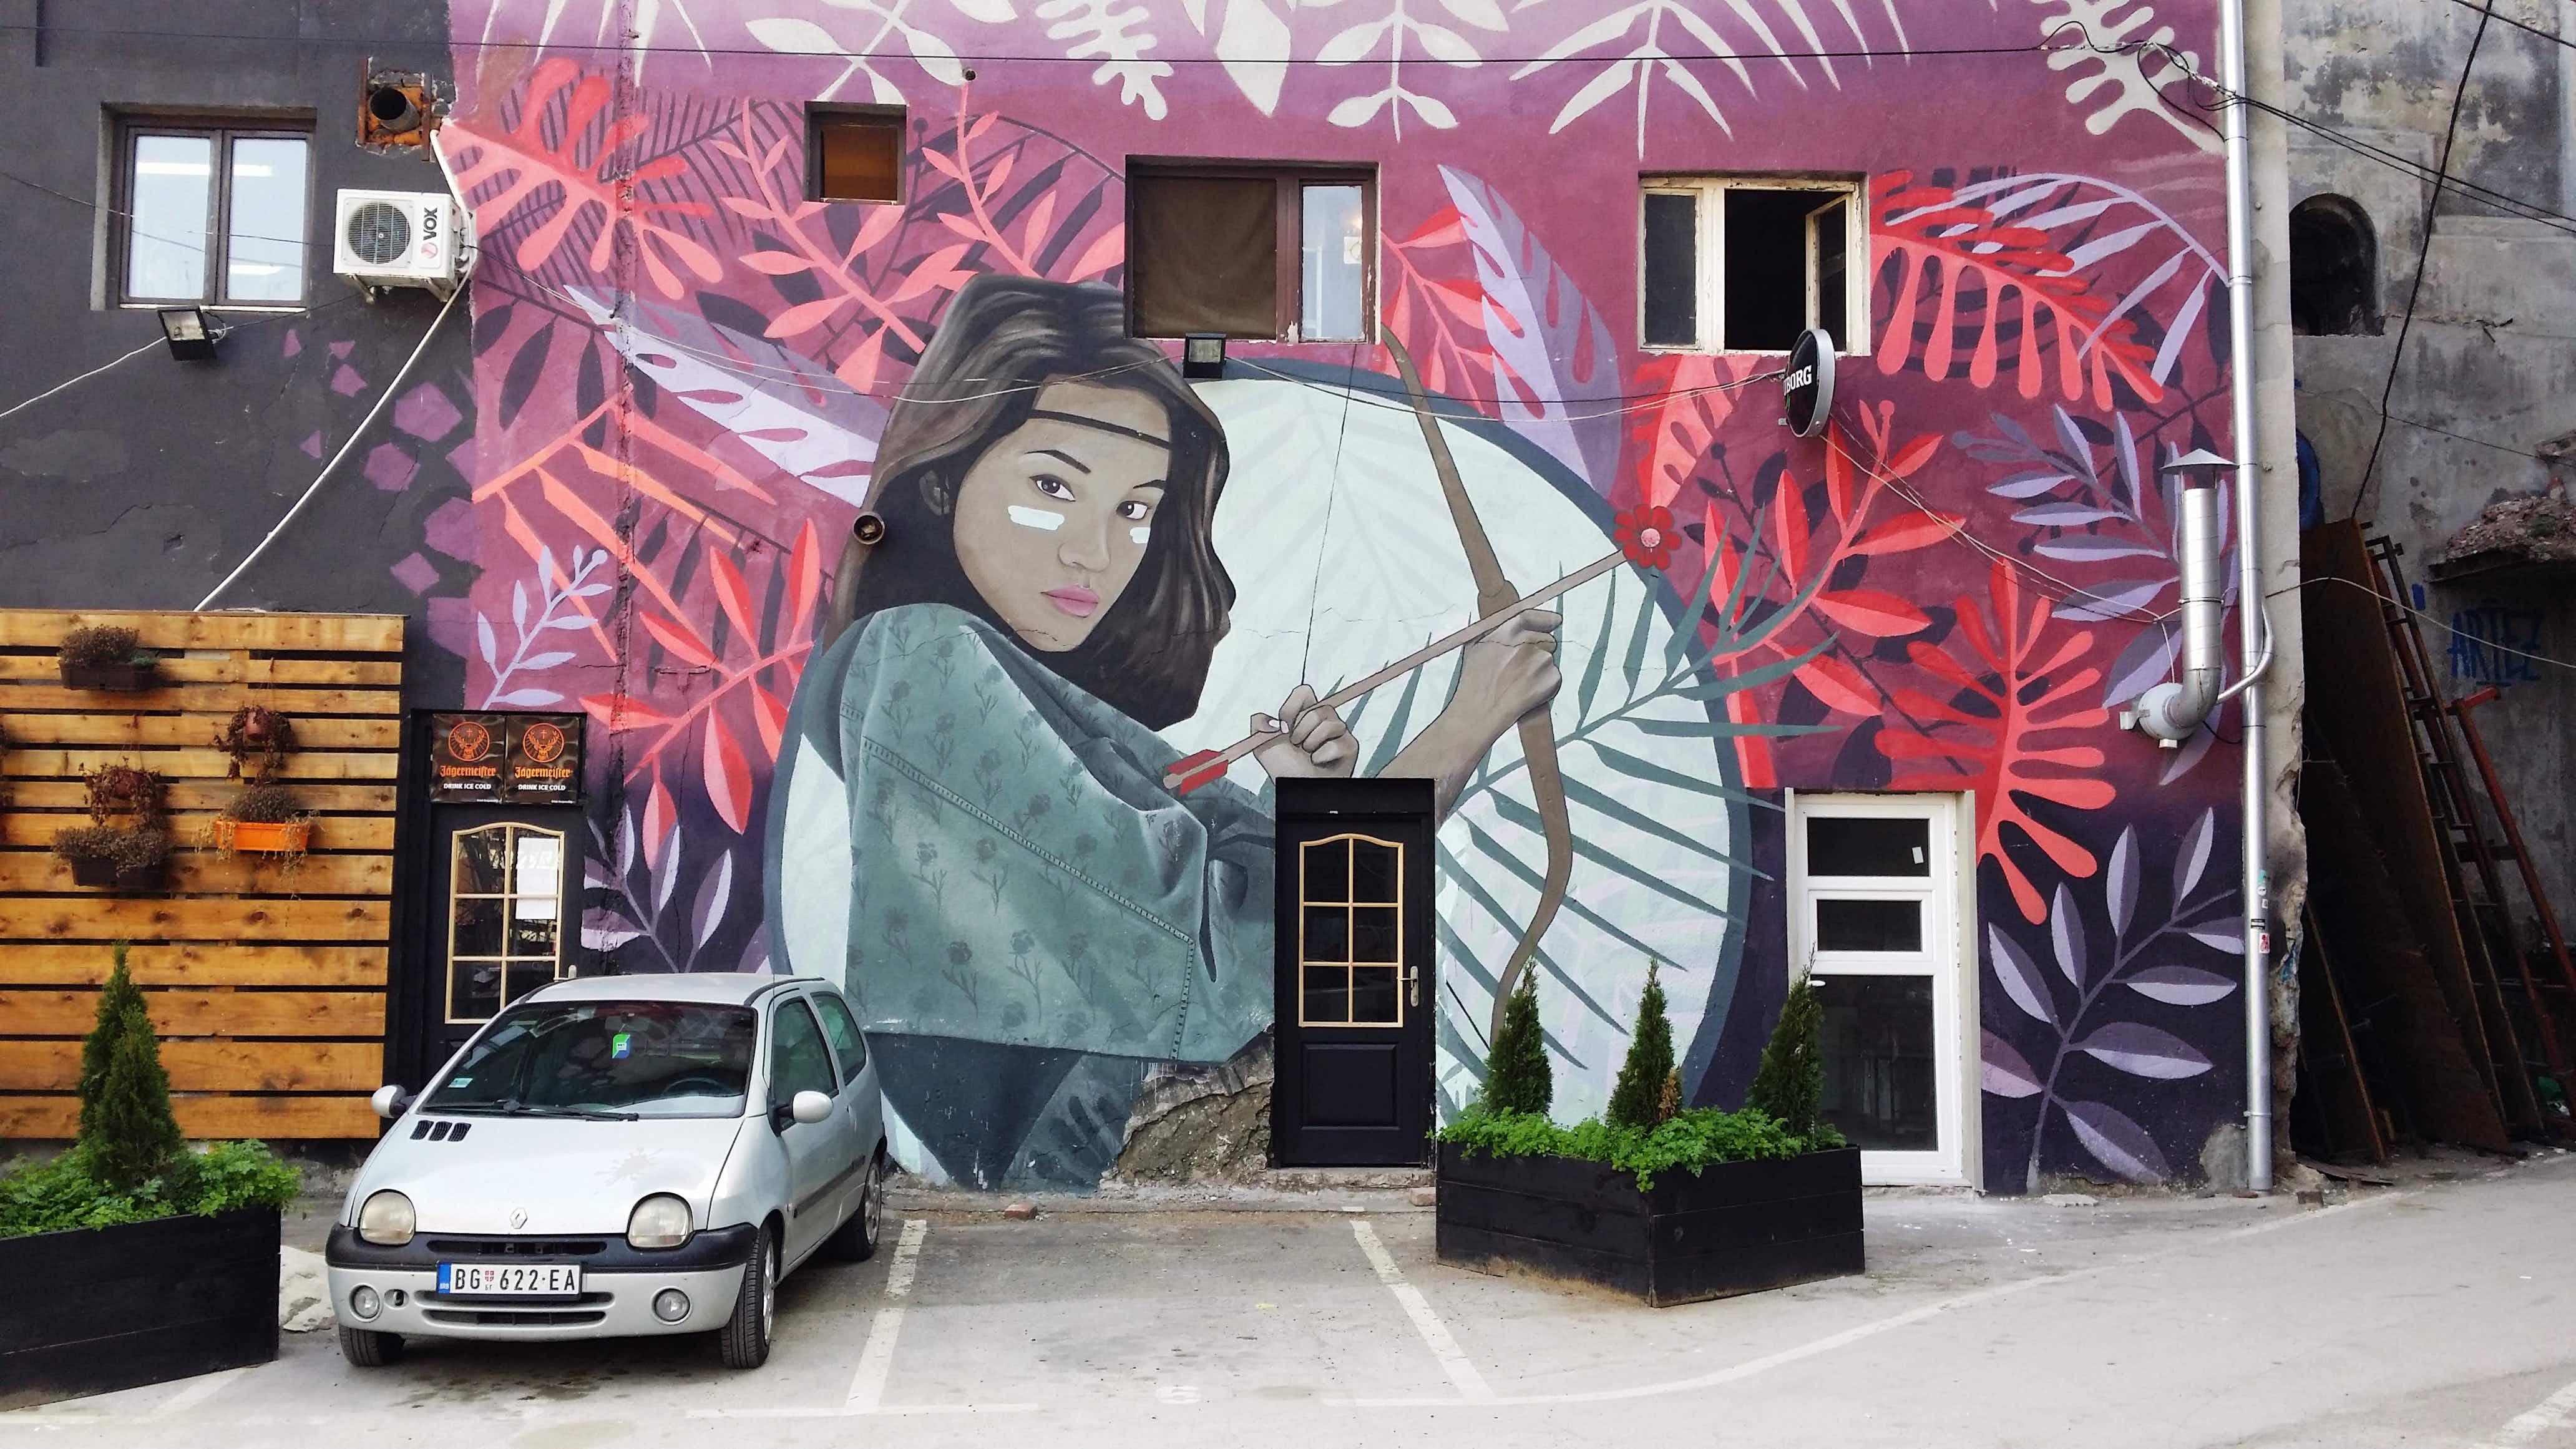 Explore the artistic side of Belgrade as Serbian artists launch street art tours